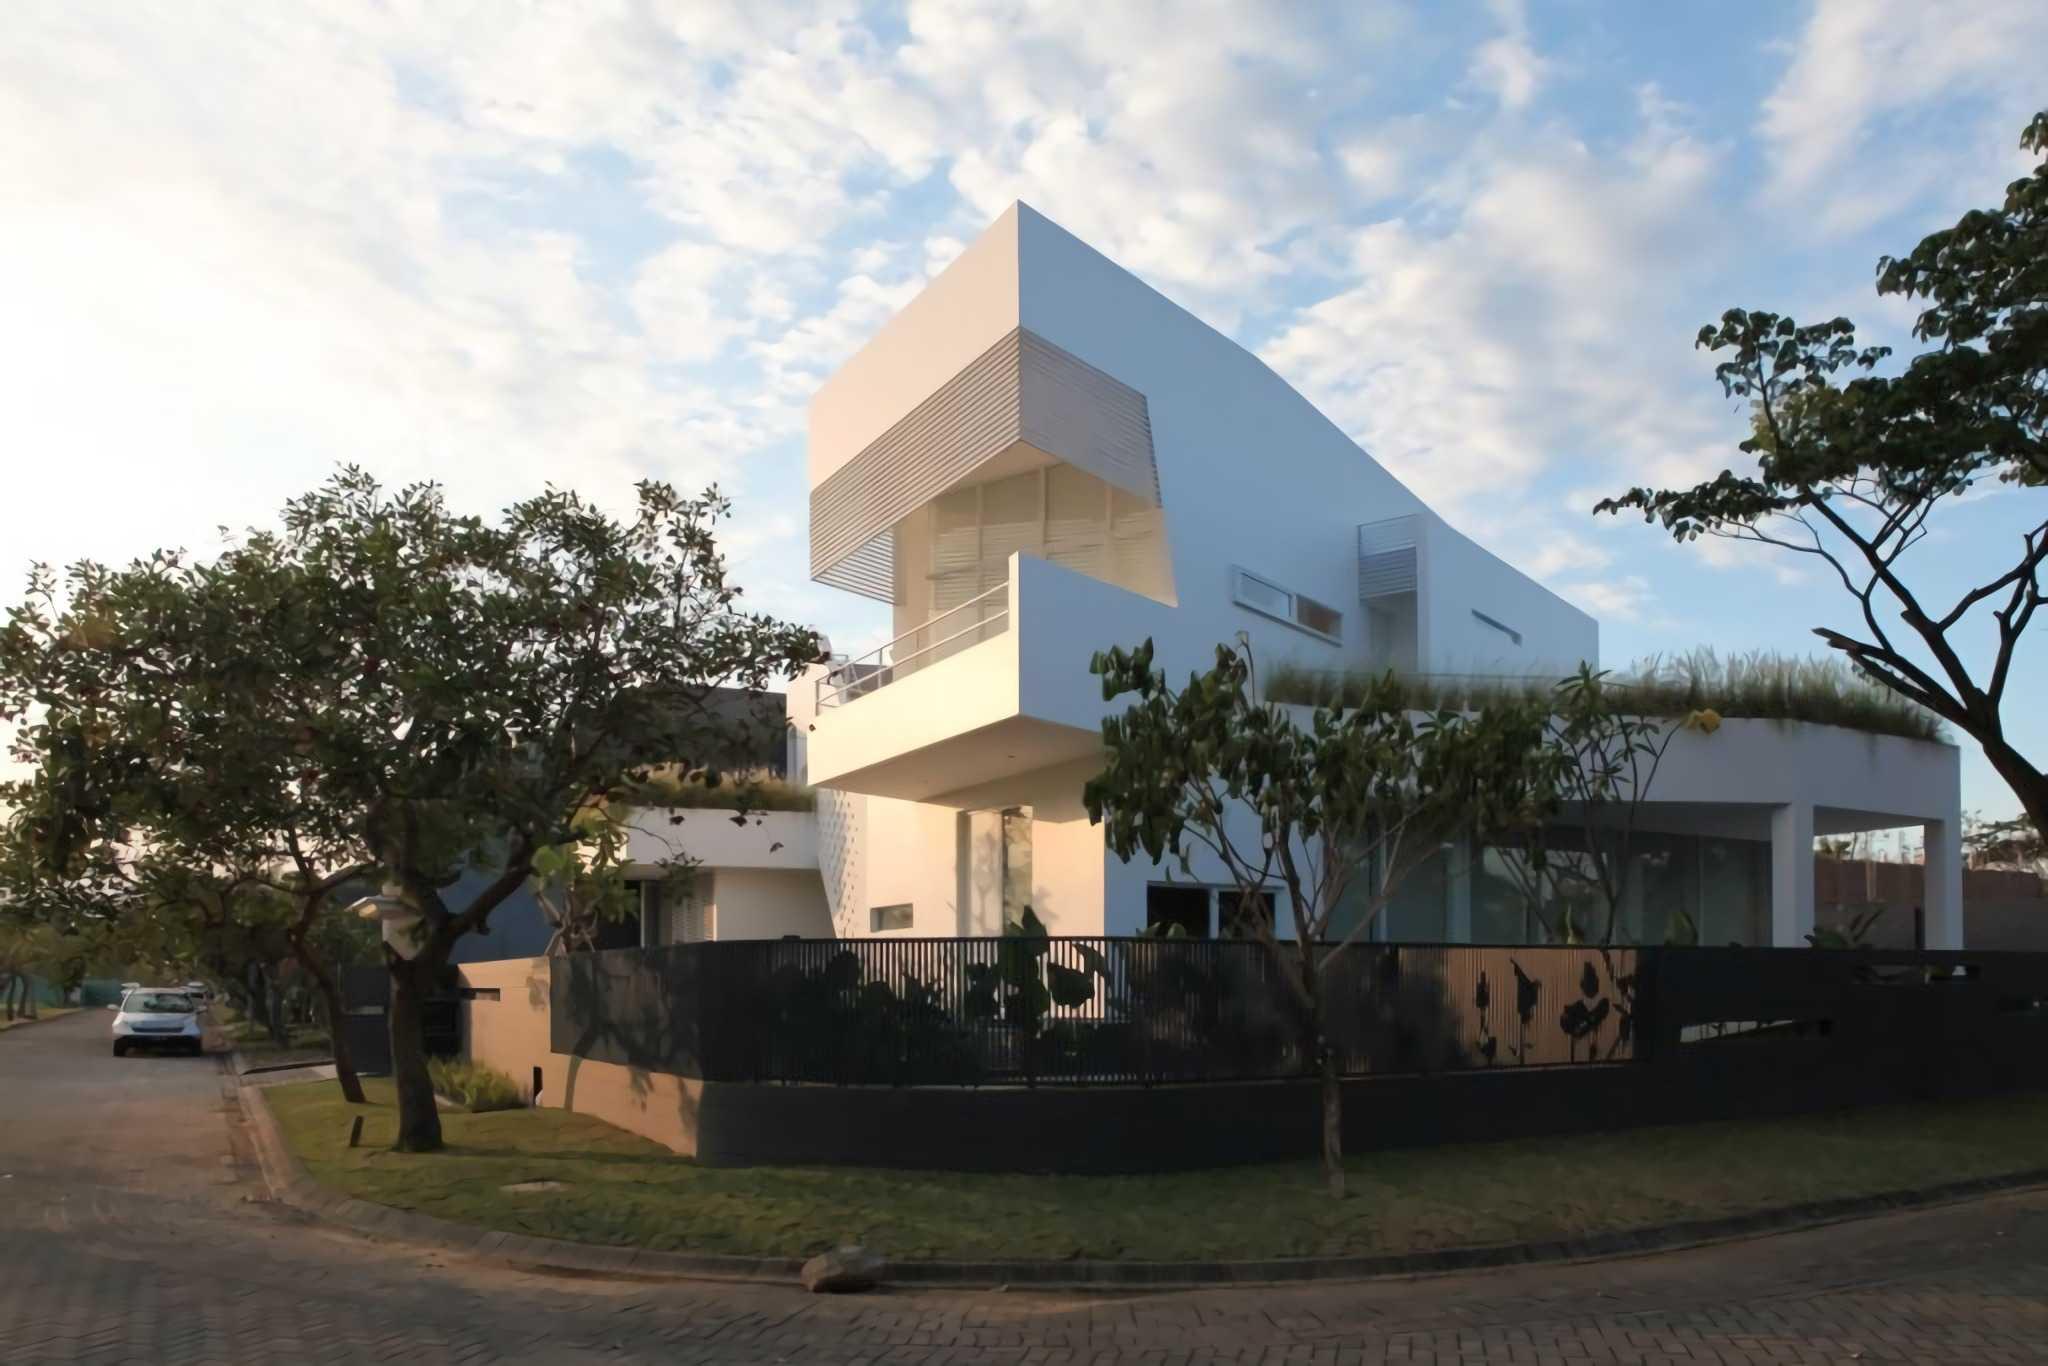 Ivan Priatman Architecture Ipcw Residence Surabaya Surabaya Street View At Day   23747